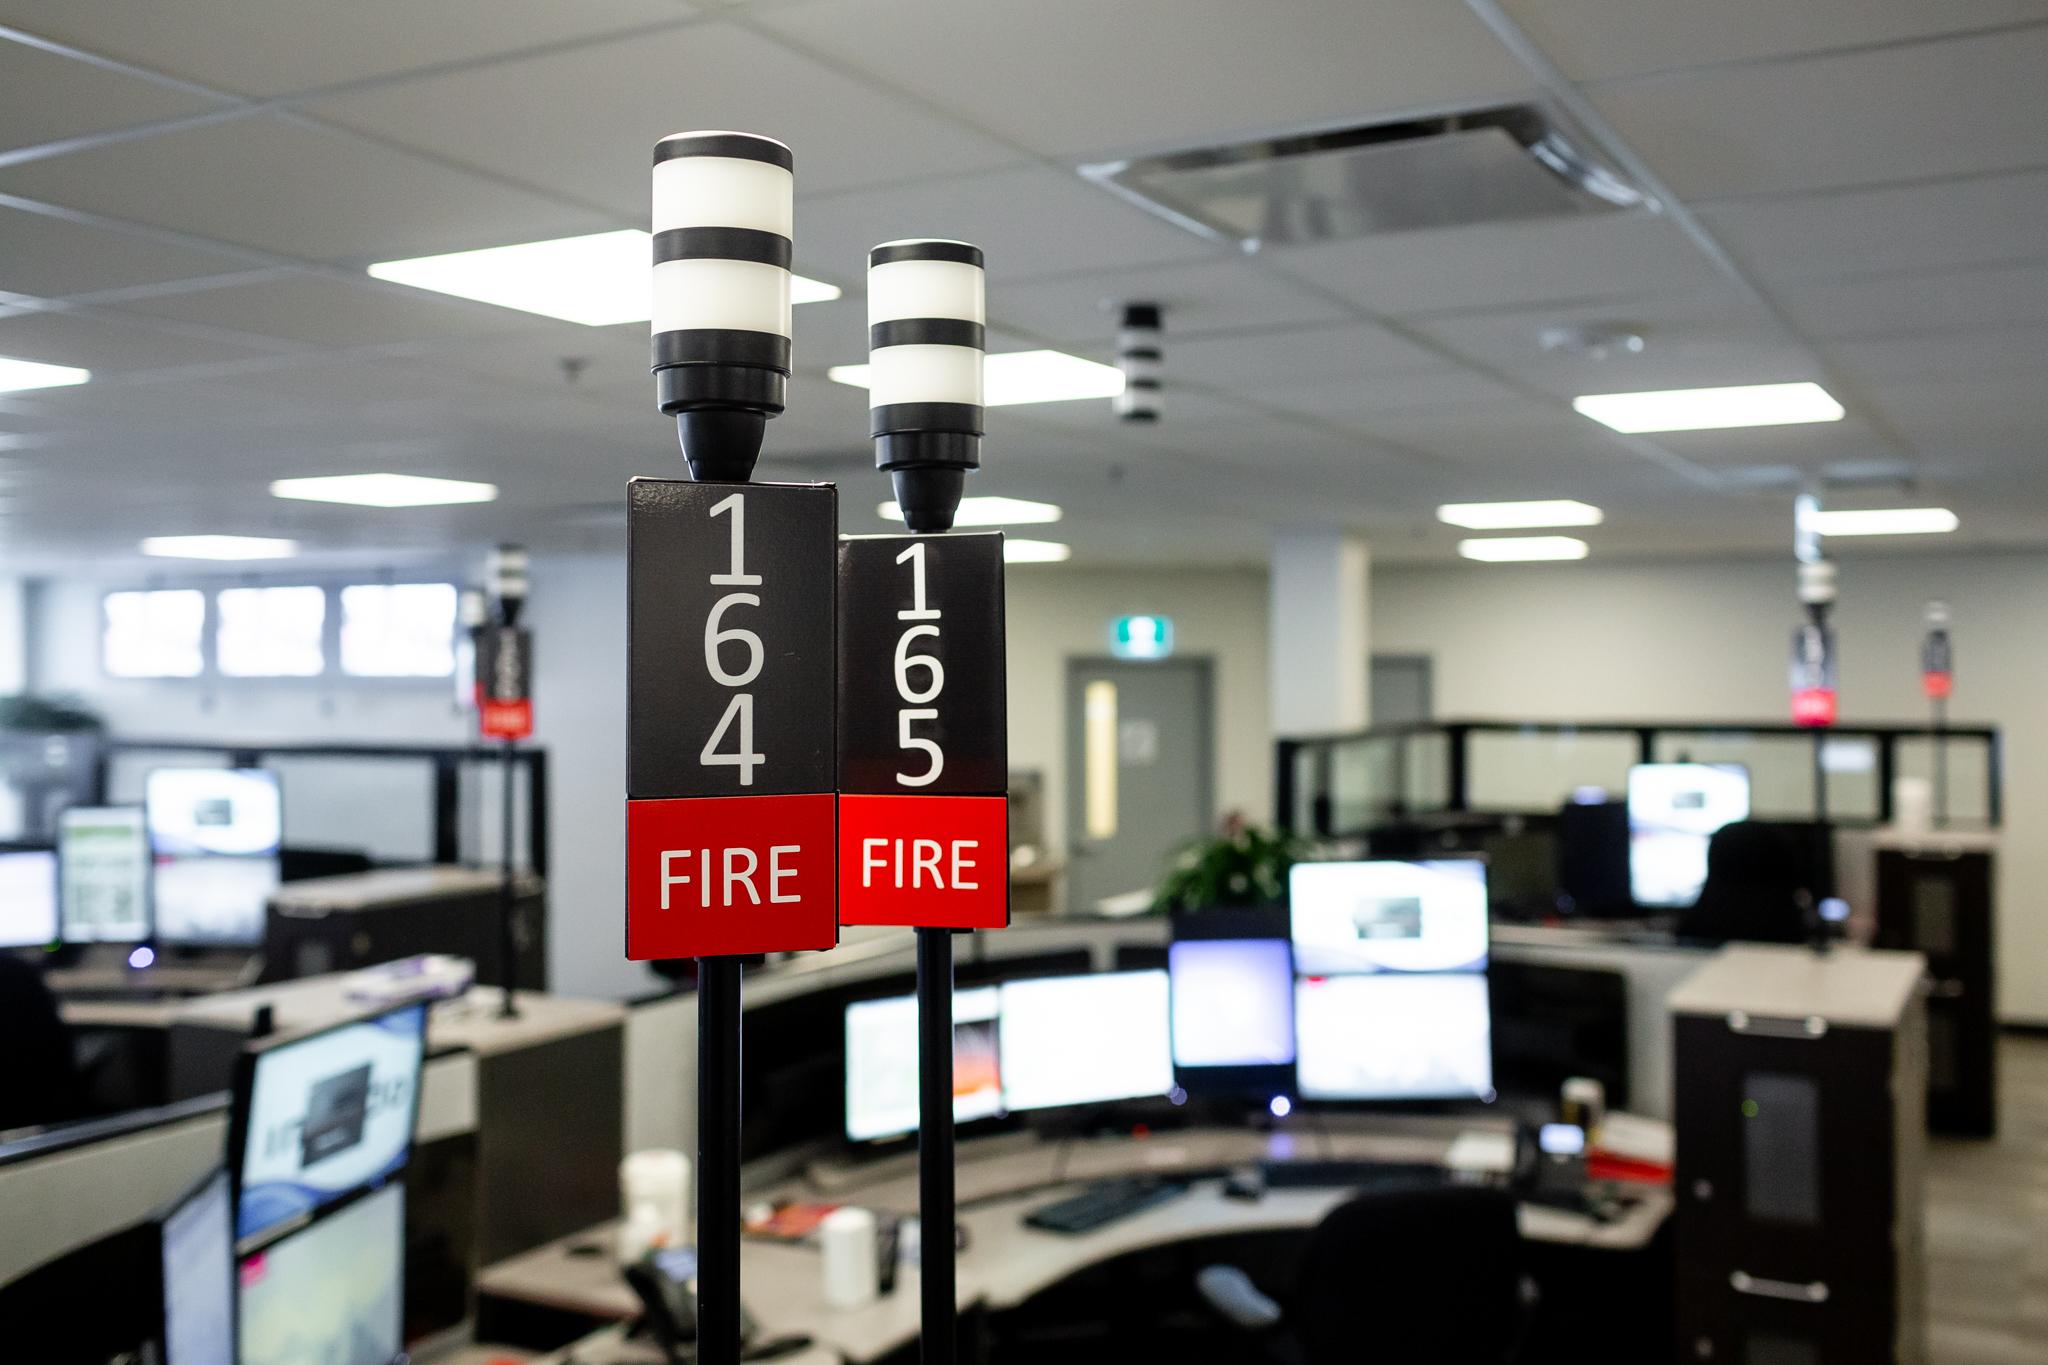 911 Center Indicator Light